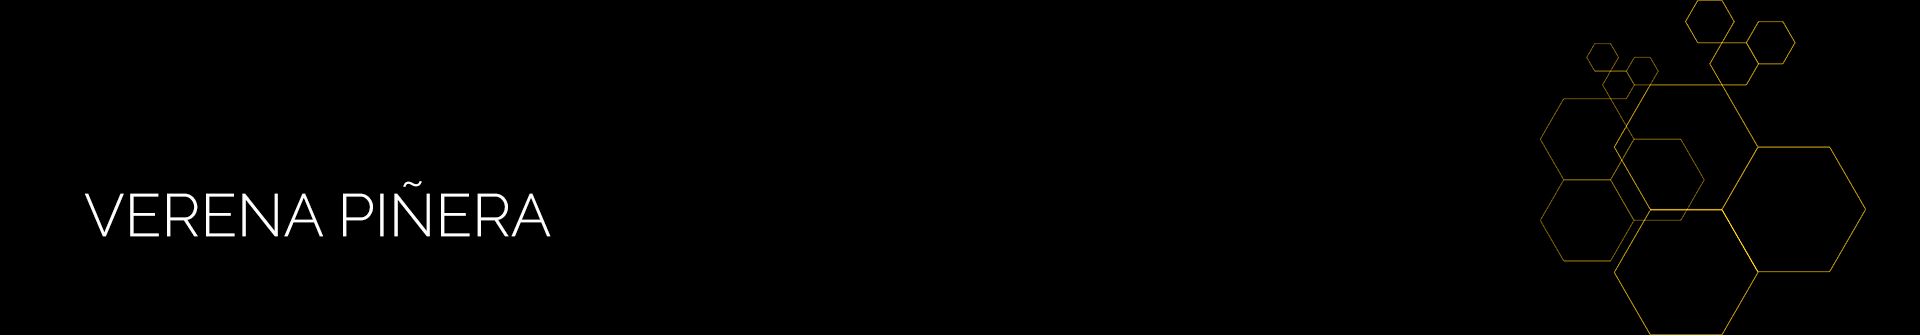 Verena piñera